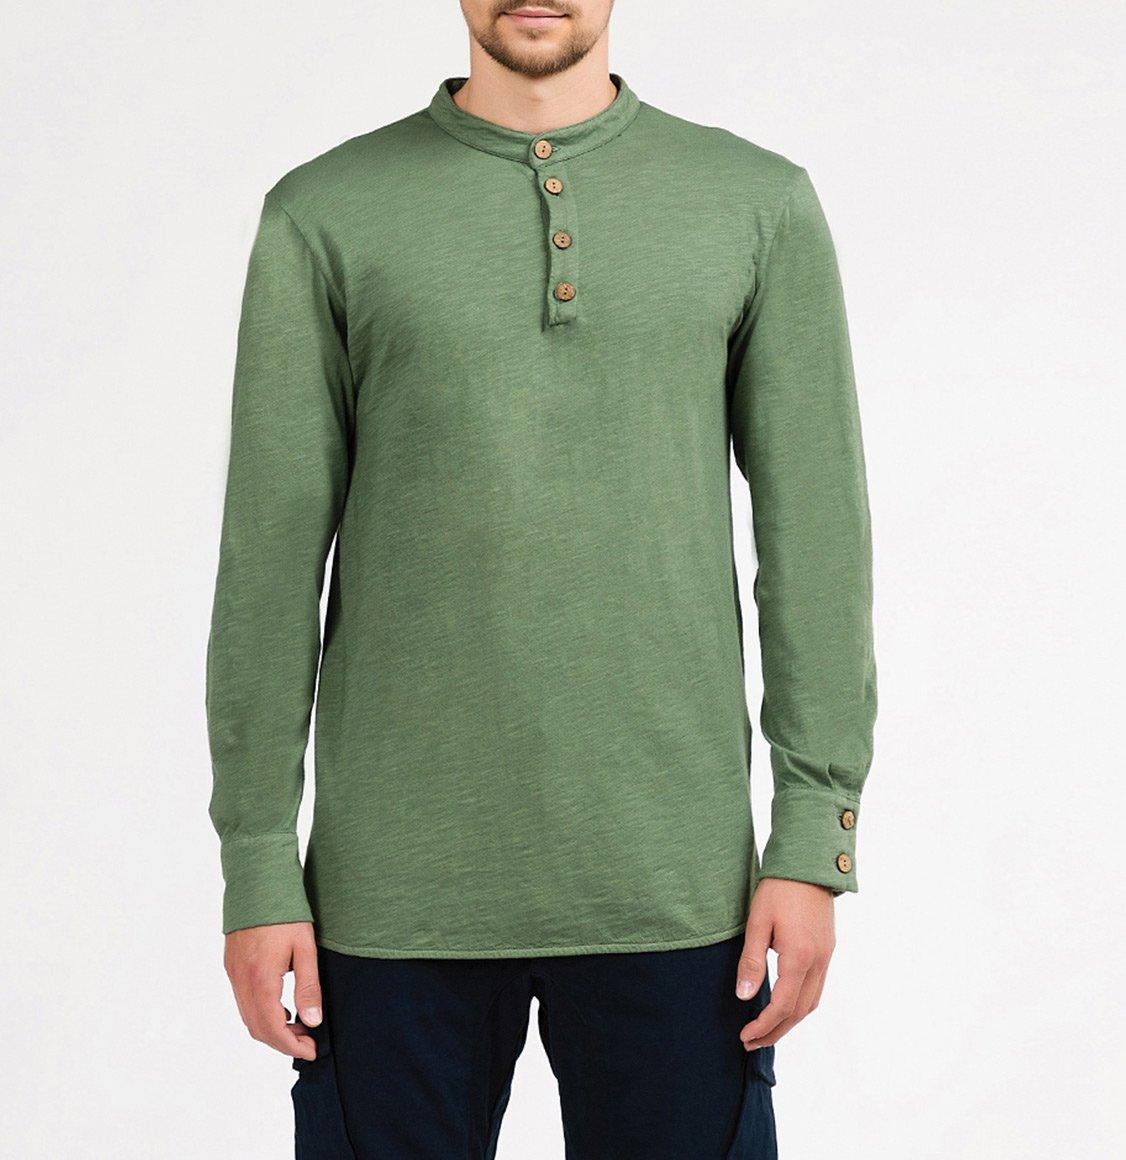 The Project Garments Henley Organic Cotton Slub Long Sleeve T-shirt Green